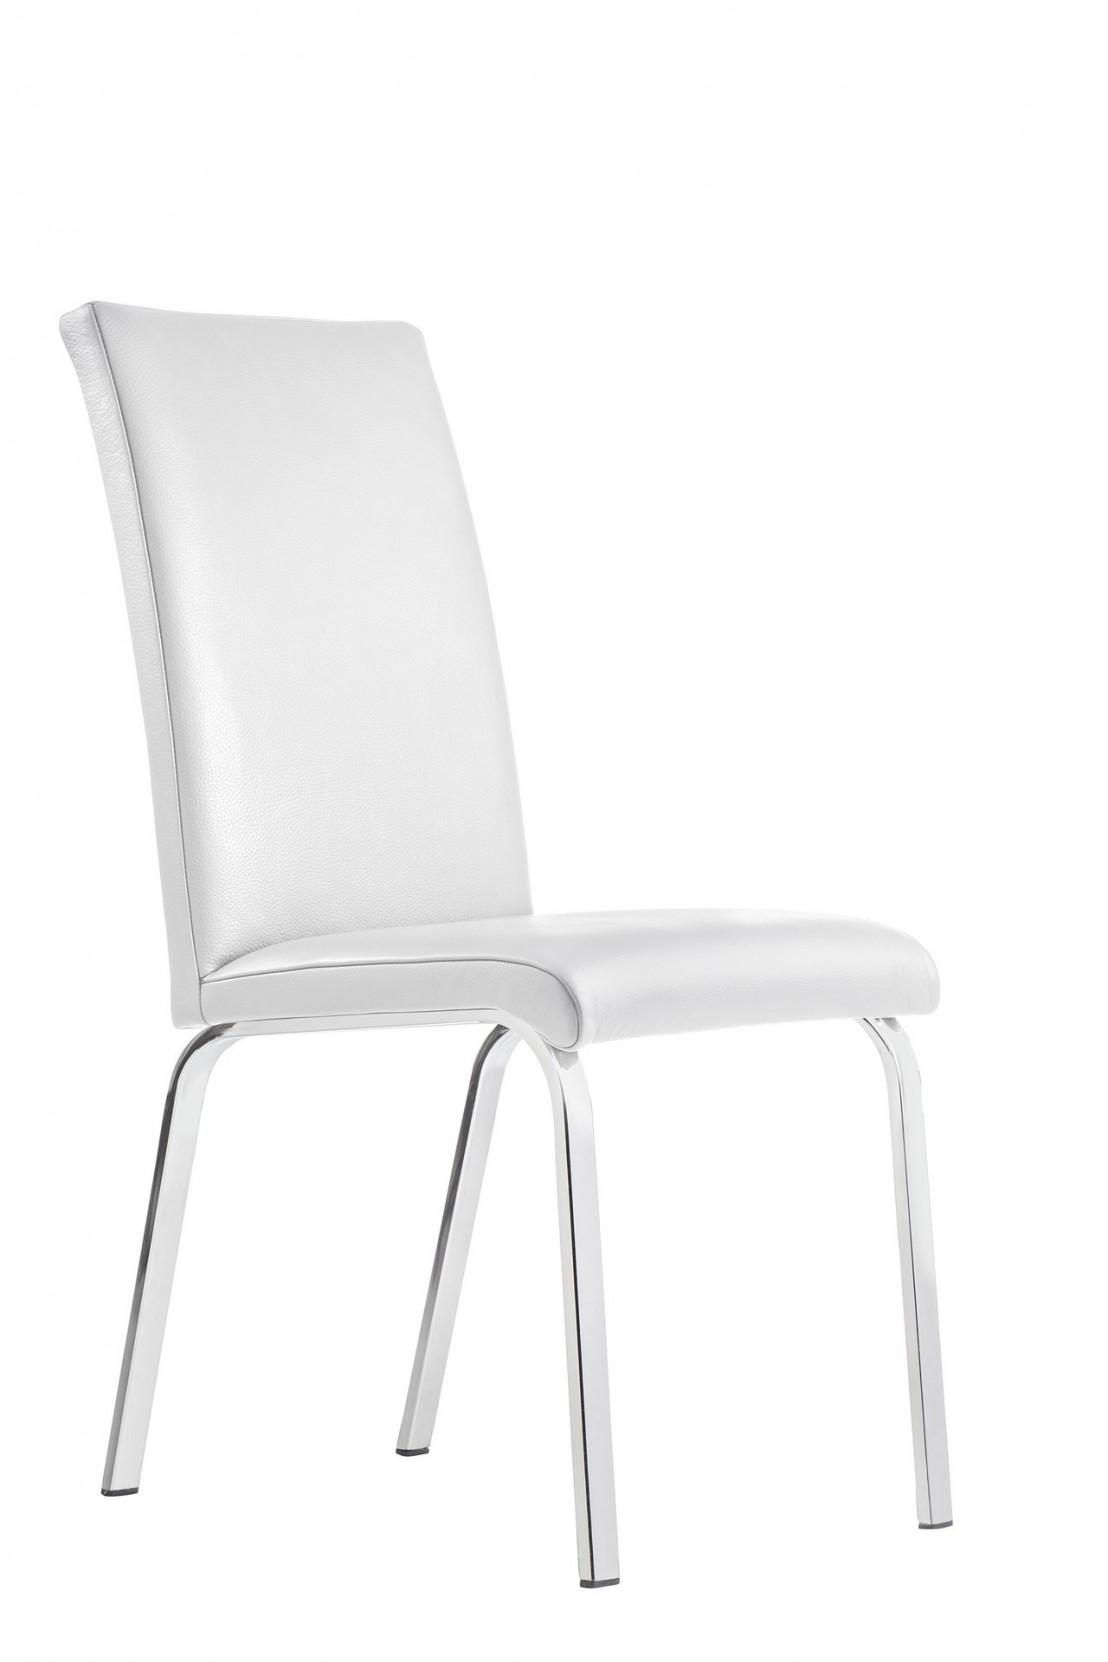 chaise design cuir trendy chaises de salle a manger design chaise design glenda loading zoom. Black Bedroom Furniture Sets. Home Design Ideas